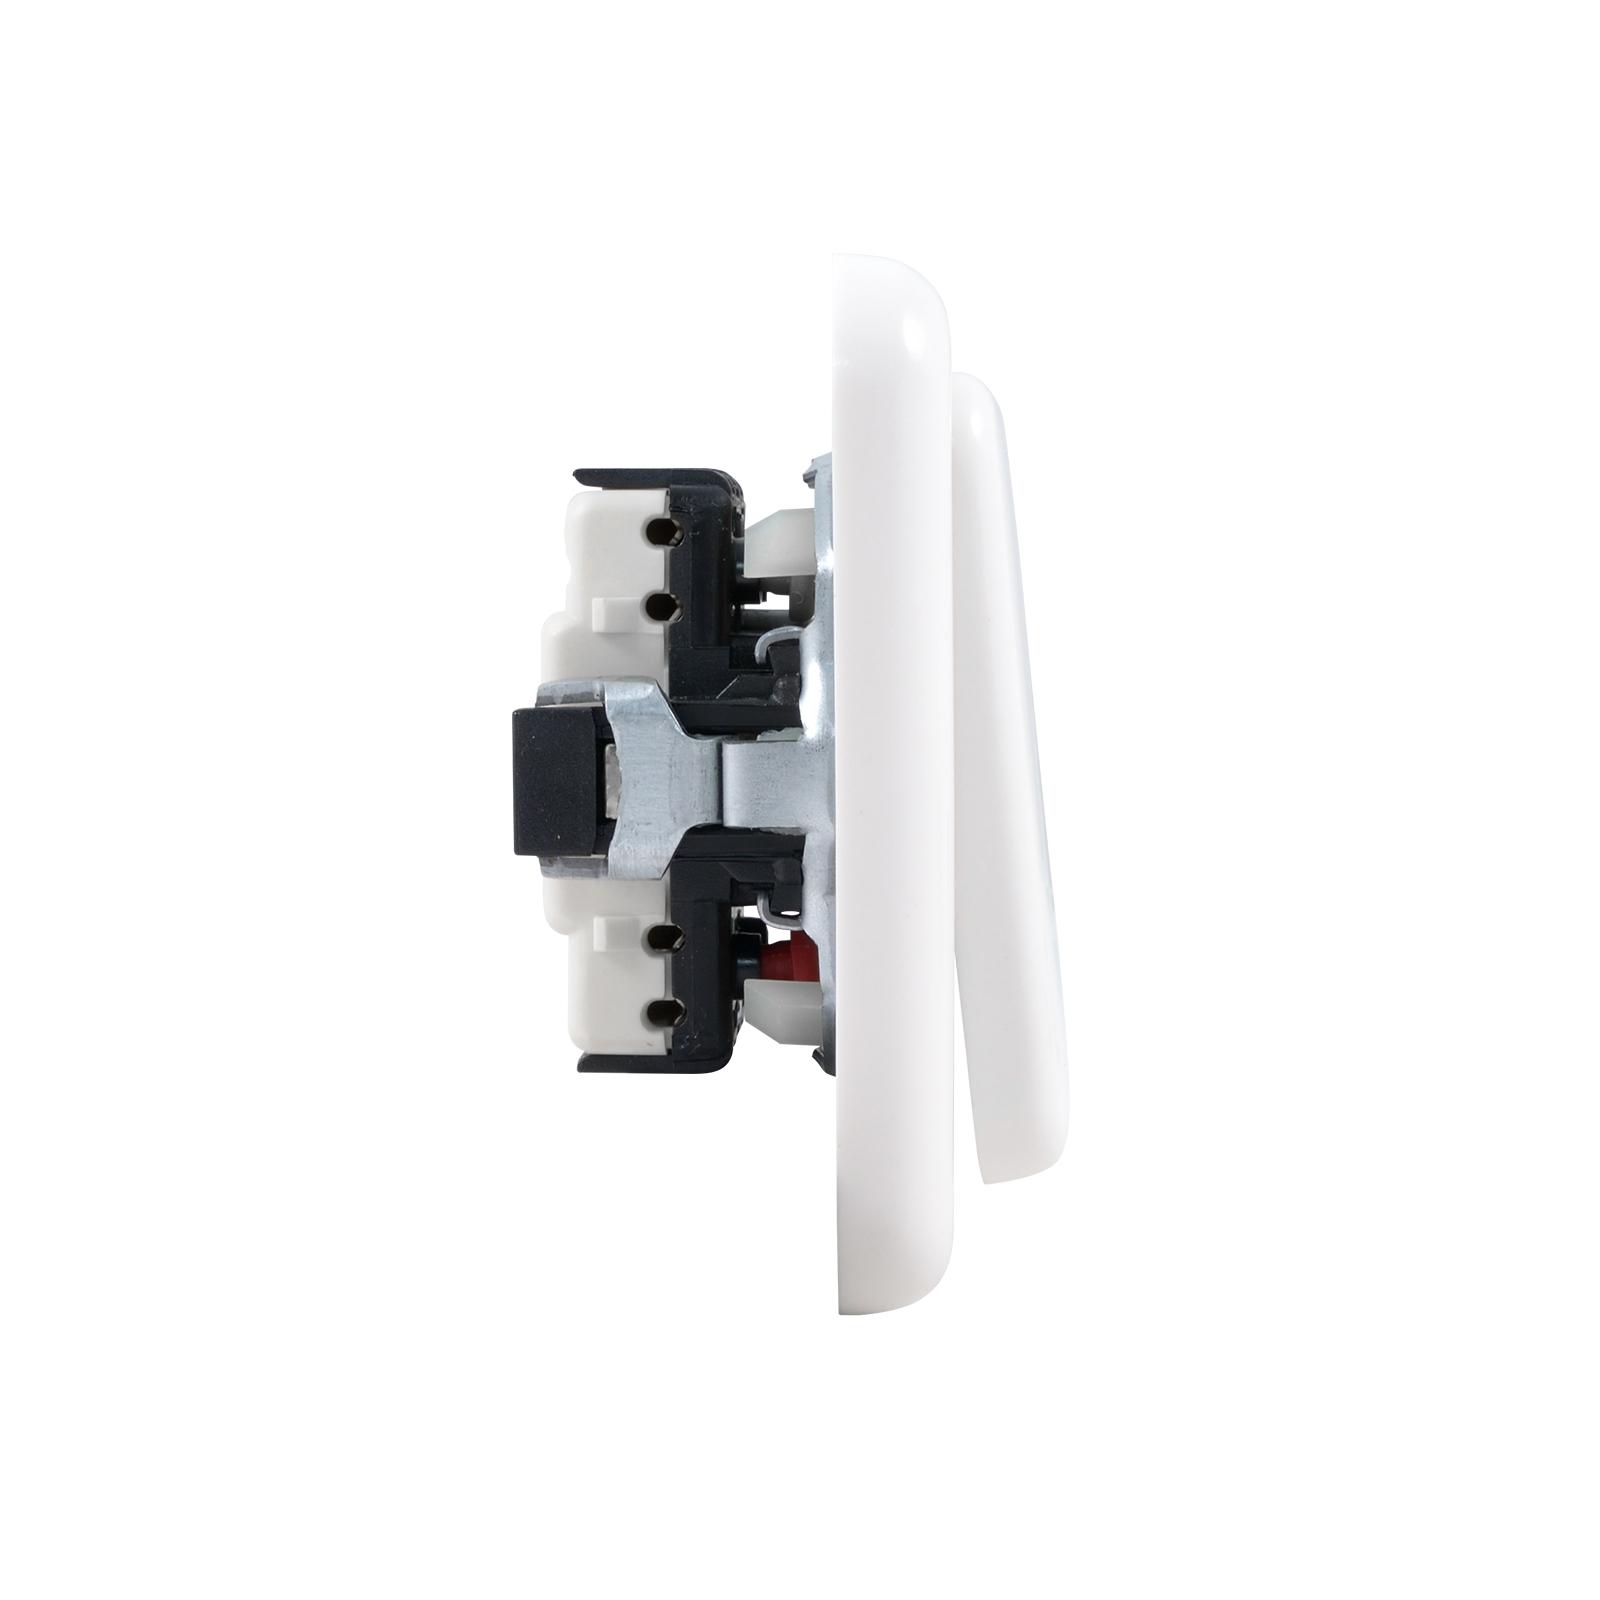 wippschalter up presto vedder regina f r rolladenmotor ebay. Black Bedroom Furniture Sets. Home Design Ideas